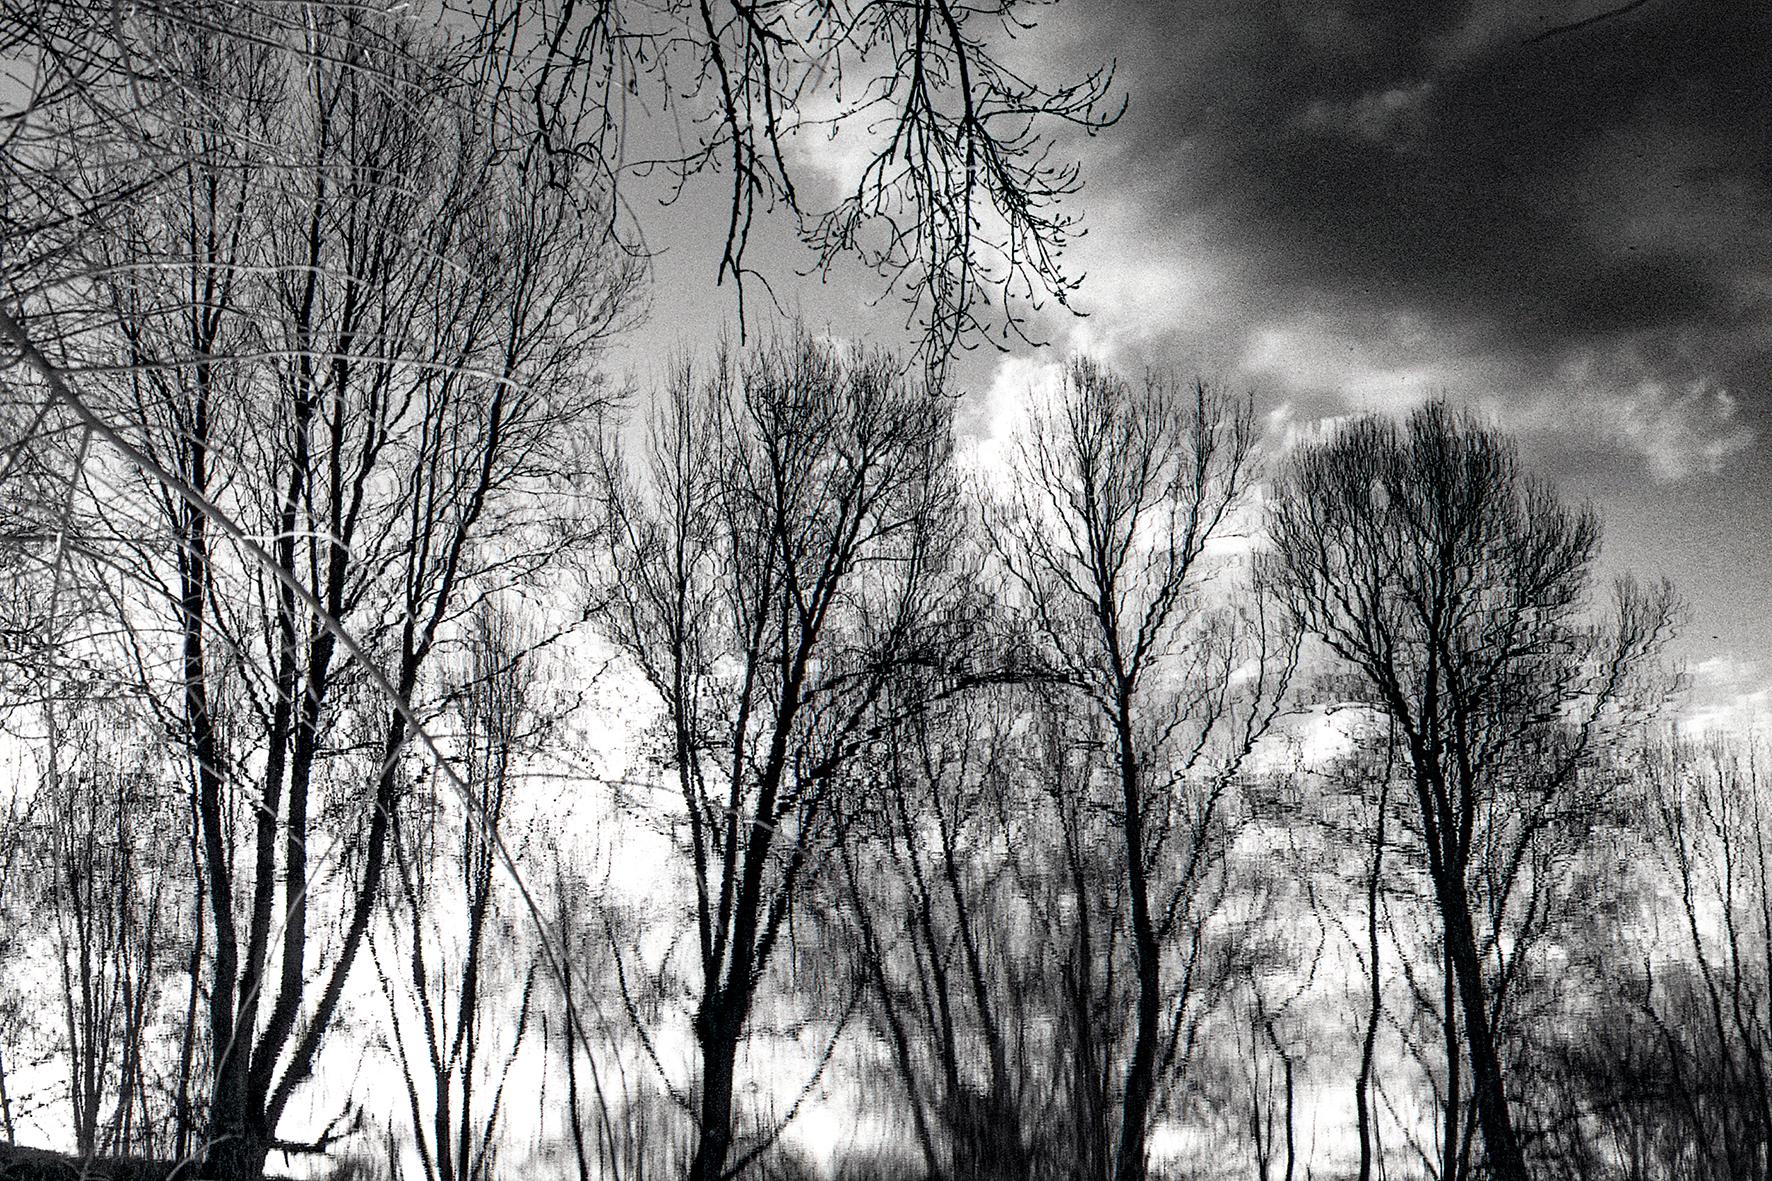 Photographe : Le graphisme naturel n°5